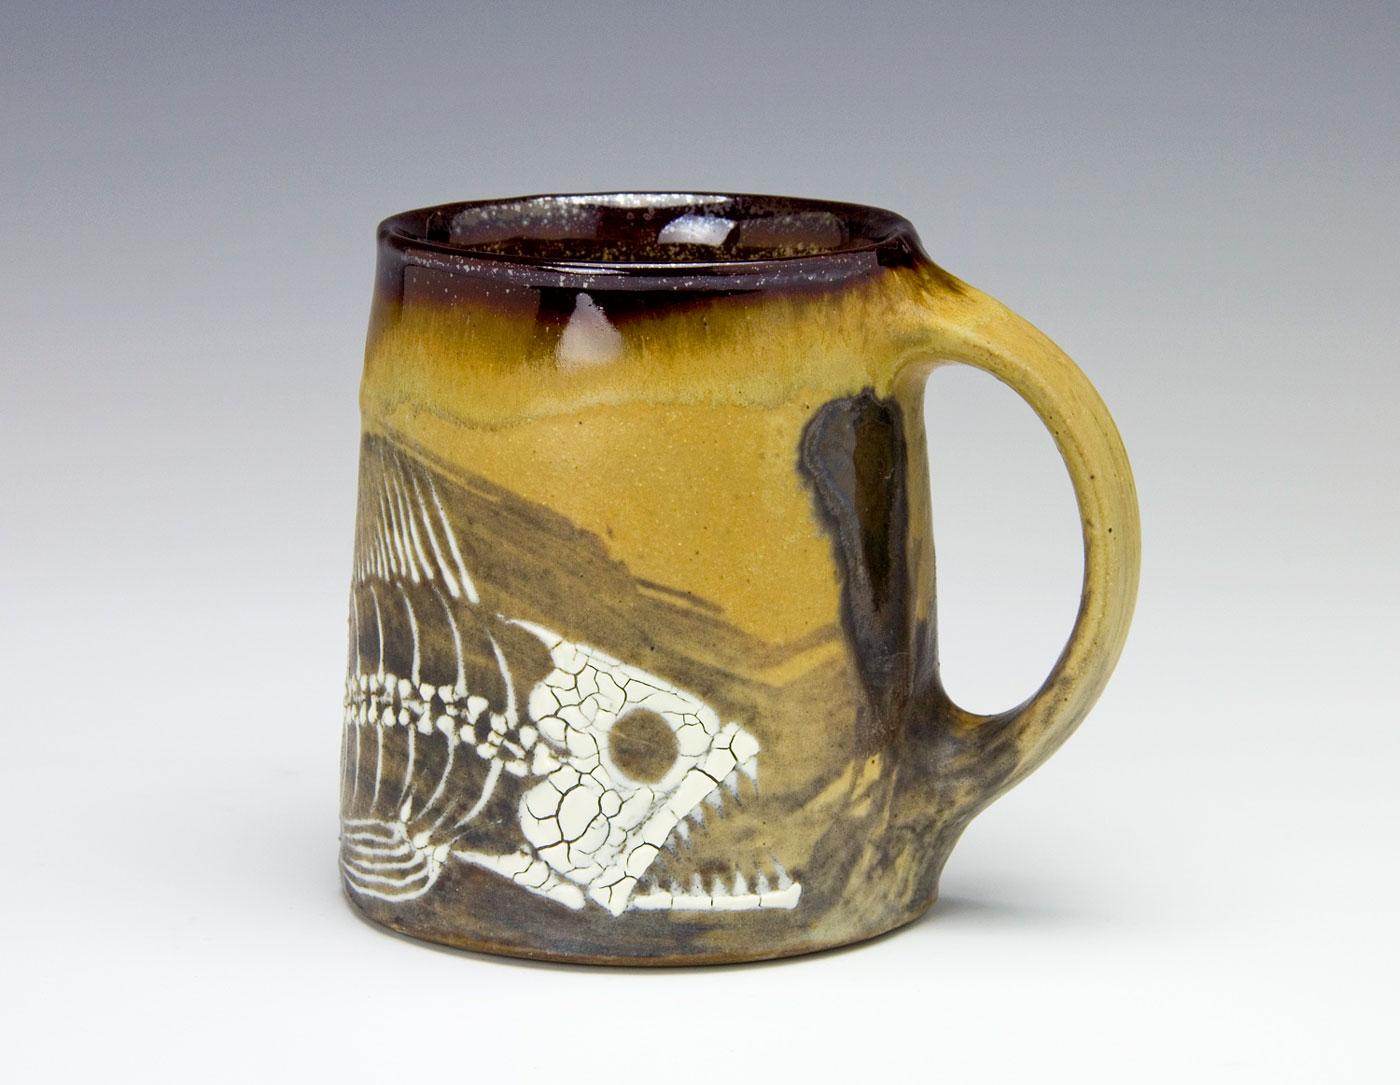 Fossil-Fish-Art-Mug-Bruce-Gholson-Seagrove-Pottery.jpg